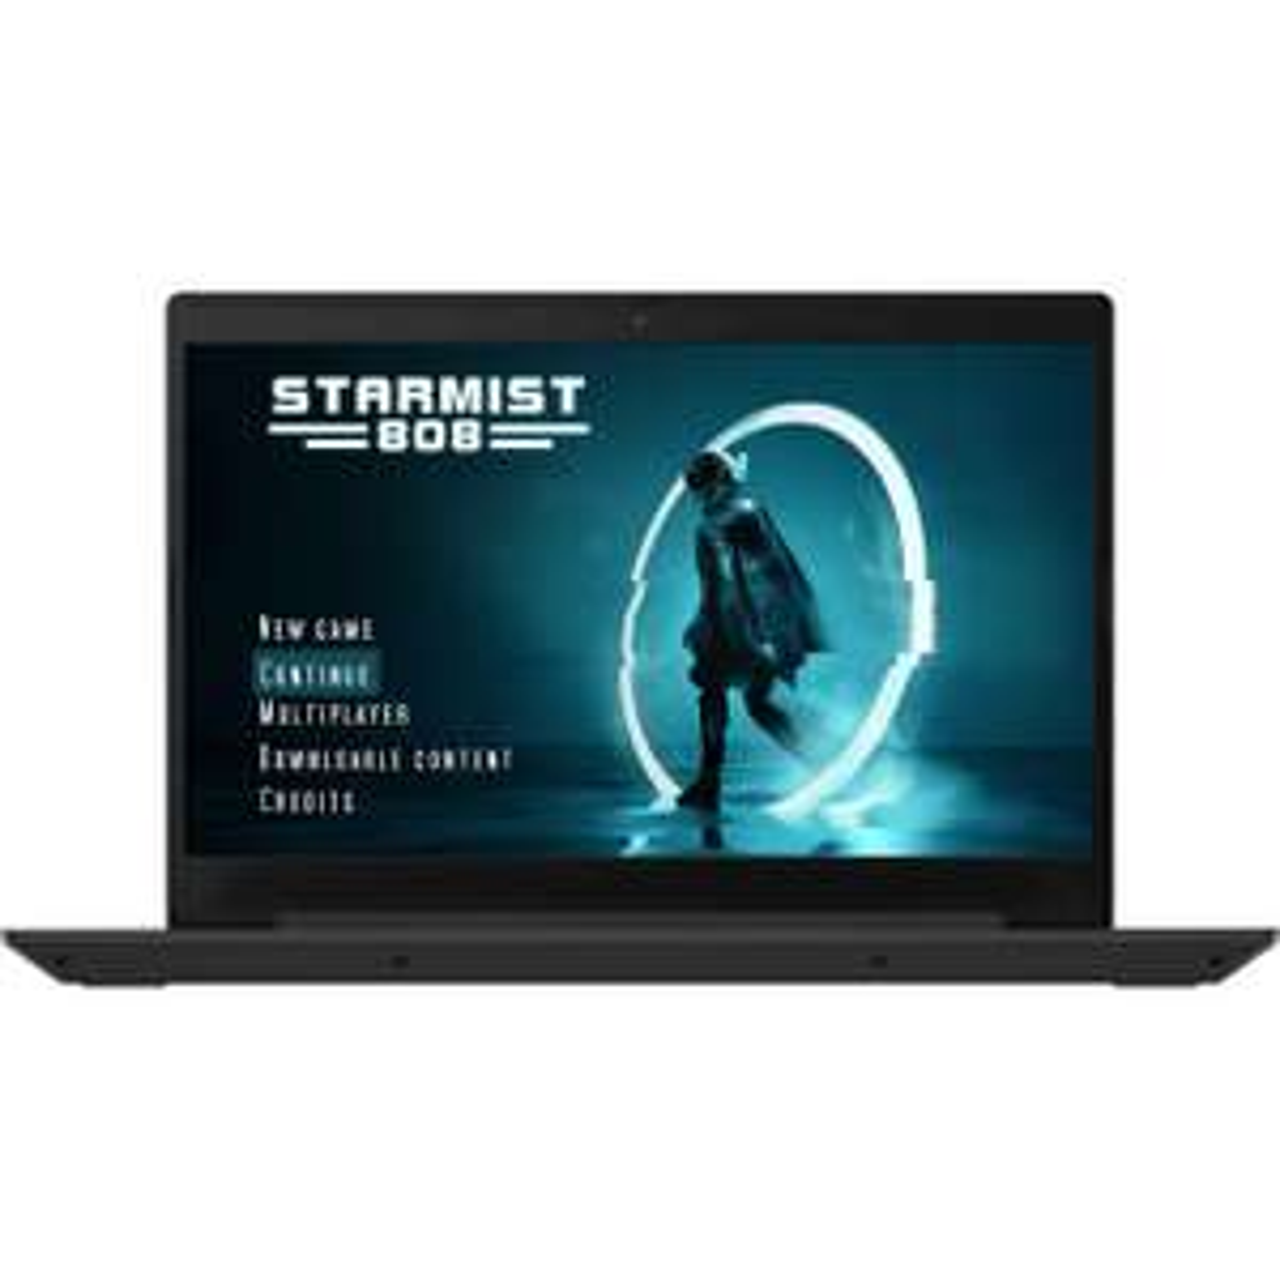 "Lenovo ideaPad L340 15.6"" FHD IPS i5-9300HF GTX 1650 8GB RAM 256GB SSD Gaming Laptop - £584.10 with code at AO"